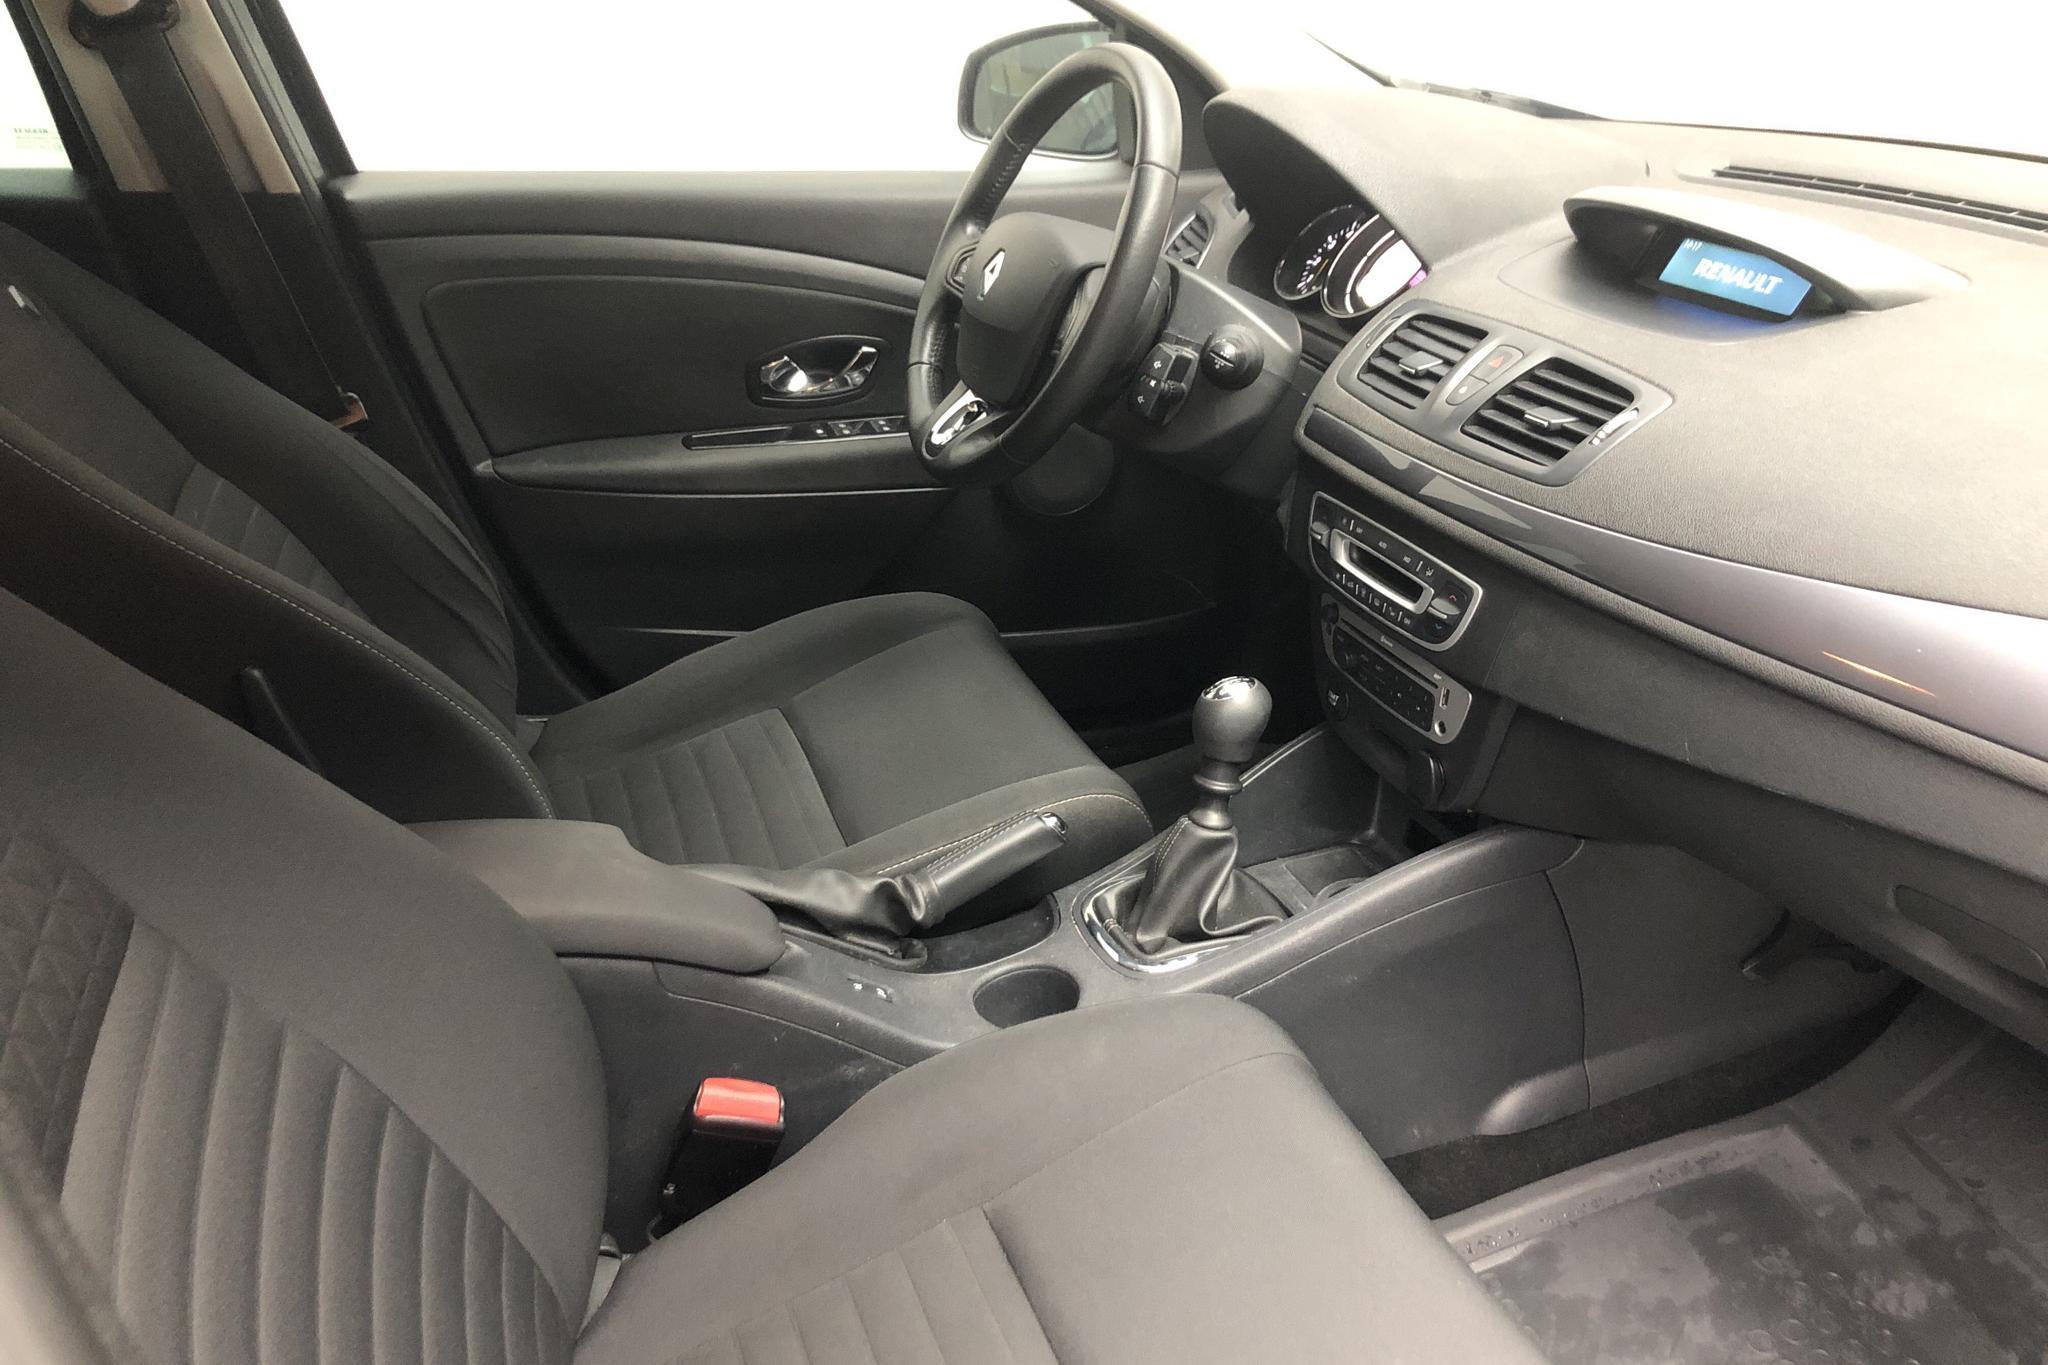 Renault Mégane Phas III 1.5 dCi 5dr (110hk) - 22 228 mil - Manuell - 2015